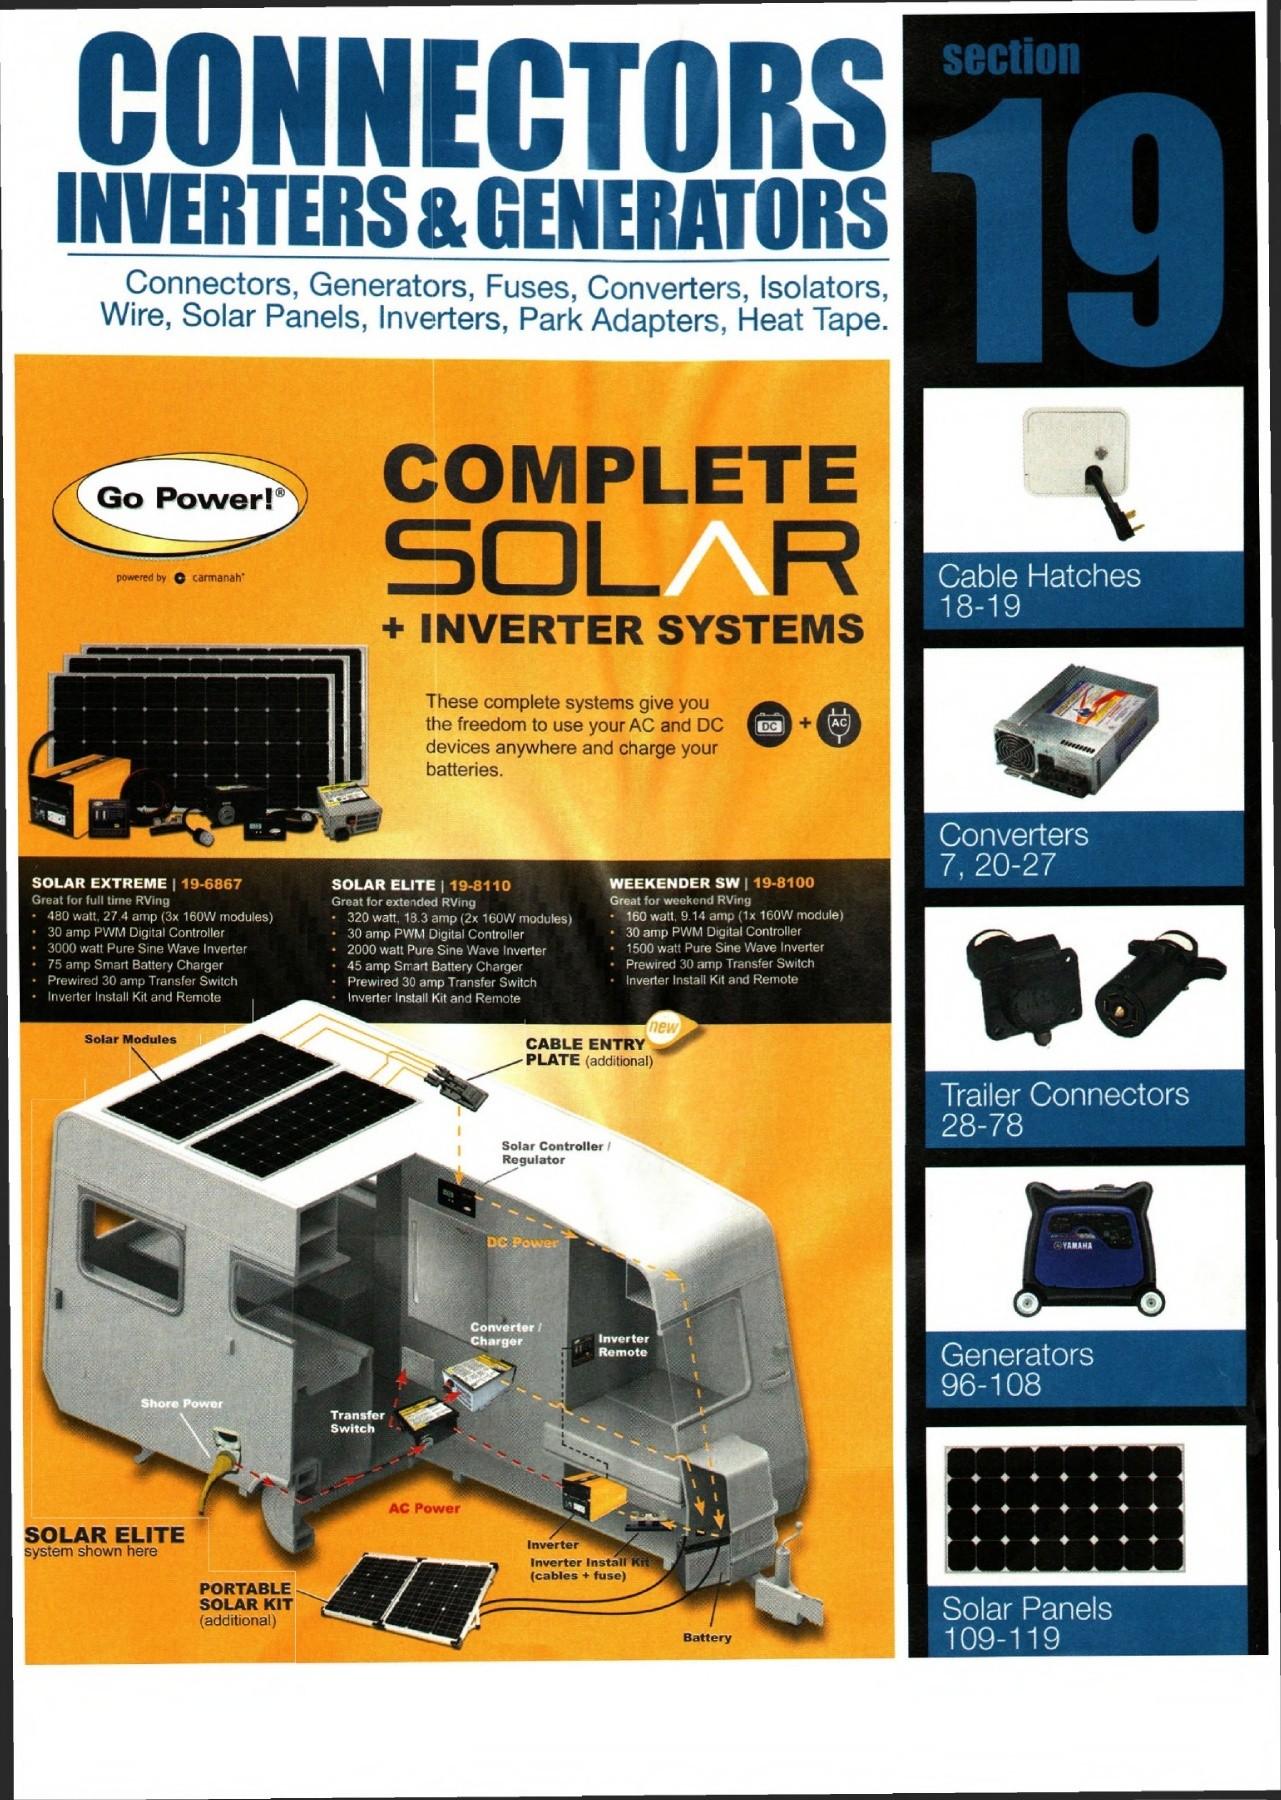 19 Connectors Inverters & Generators